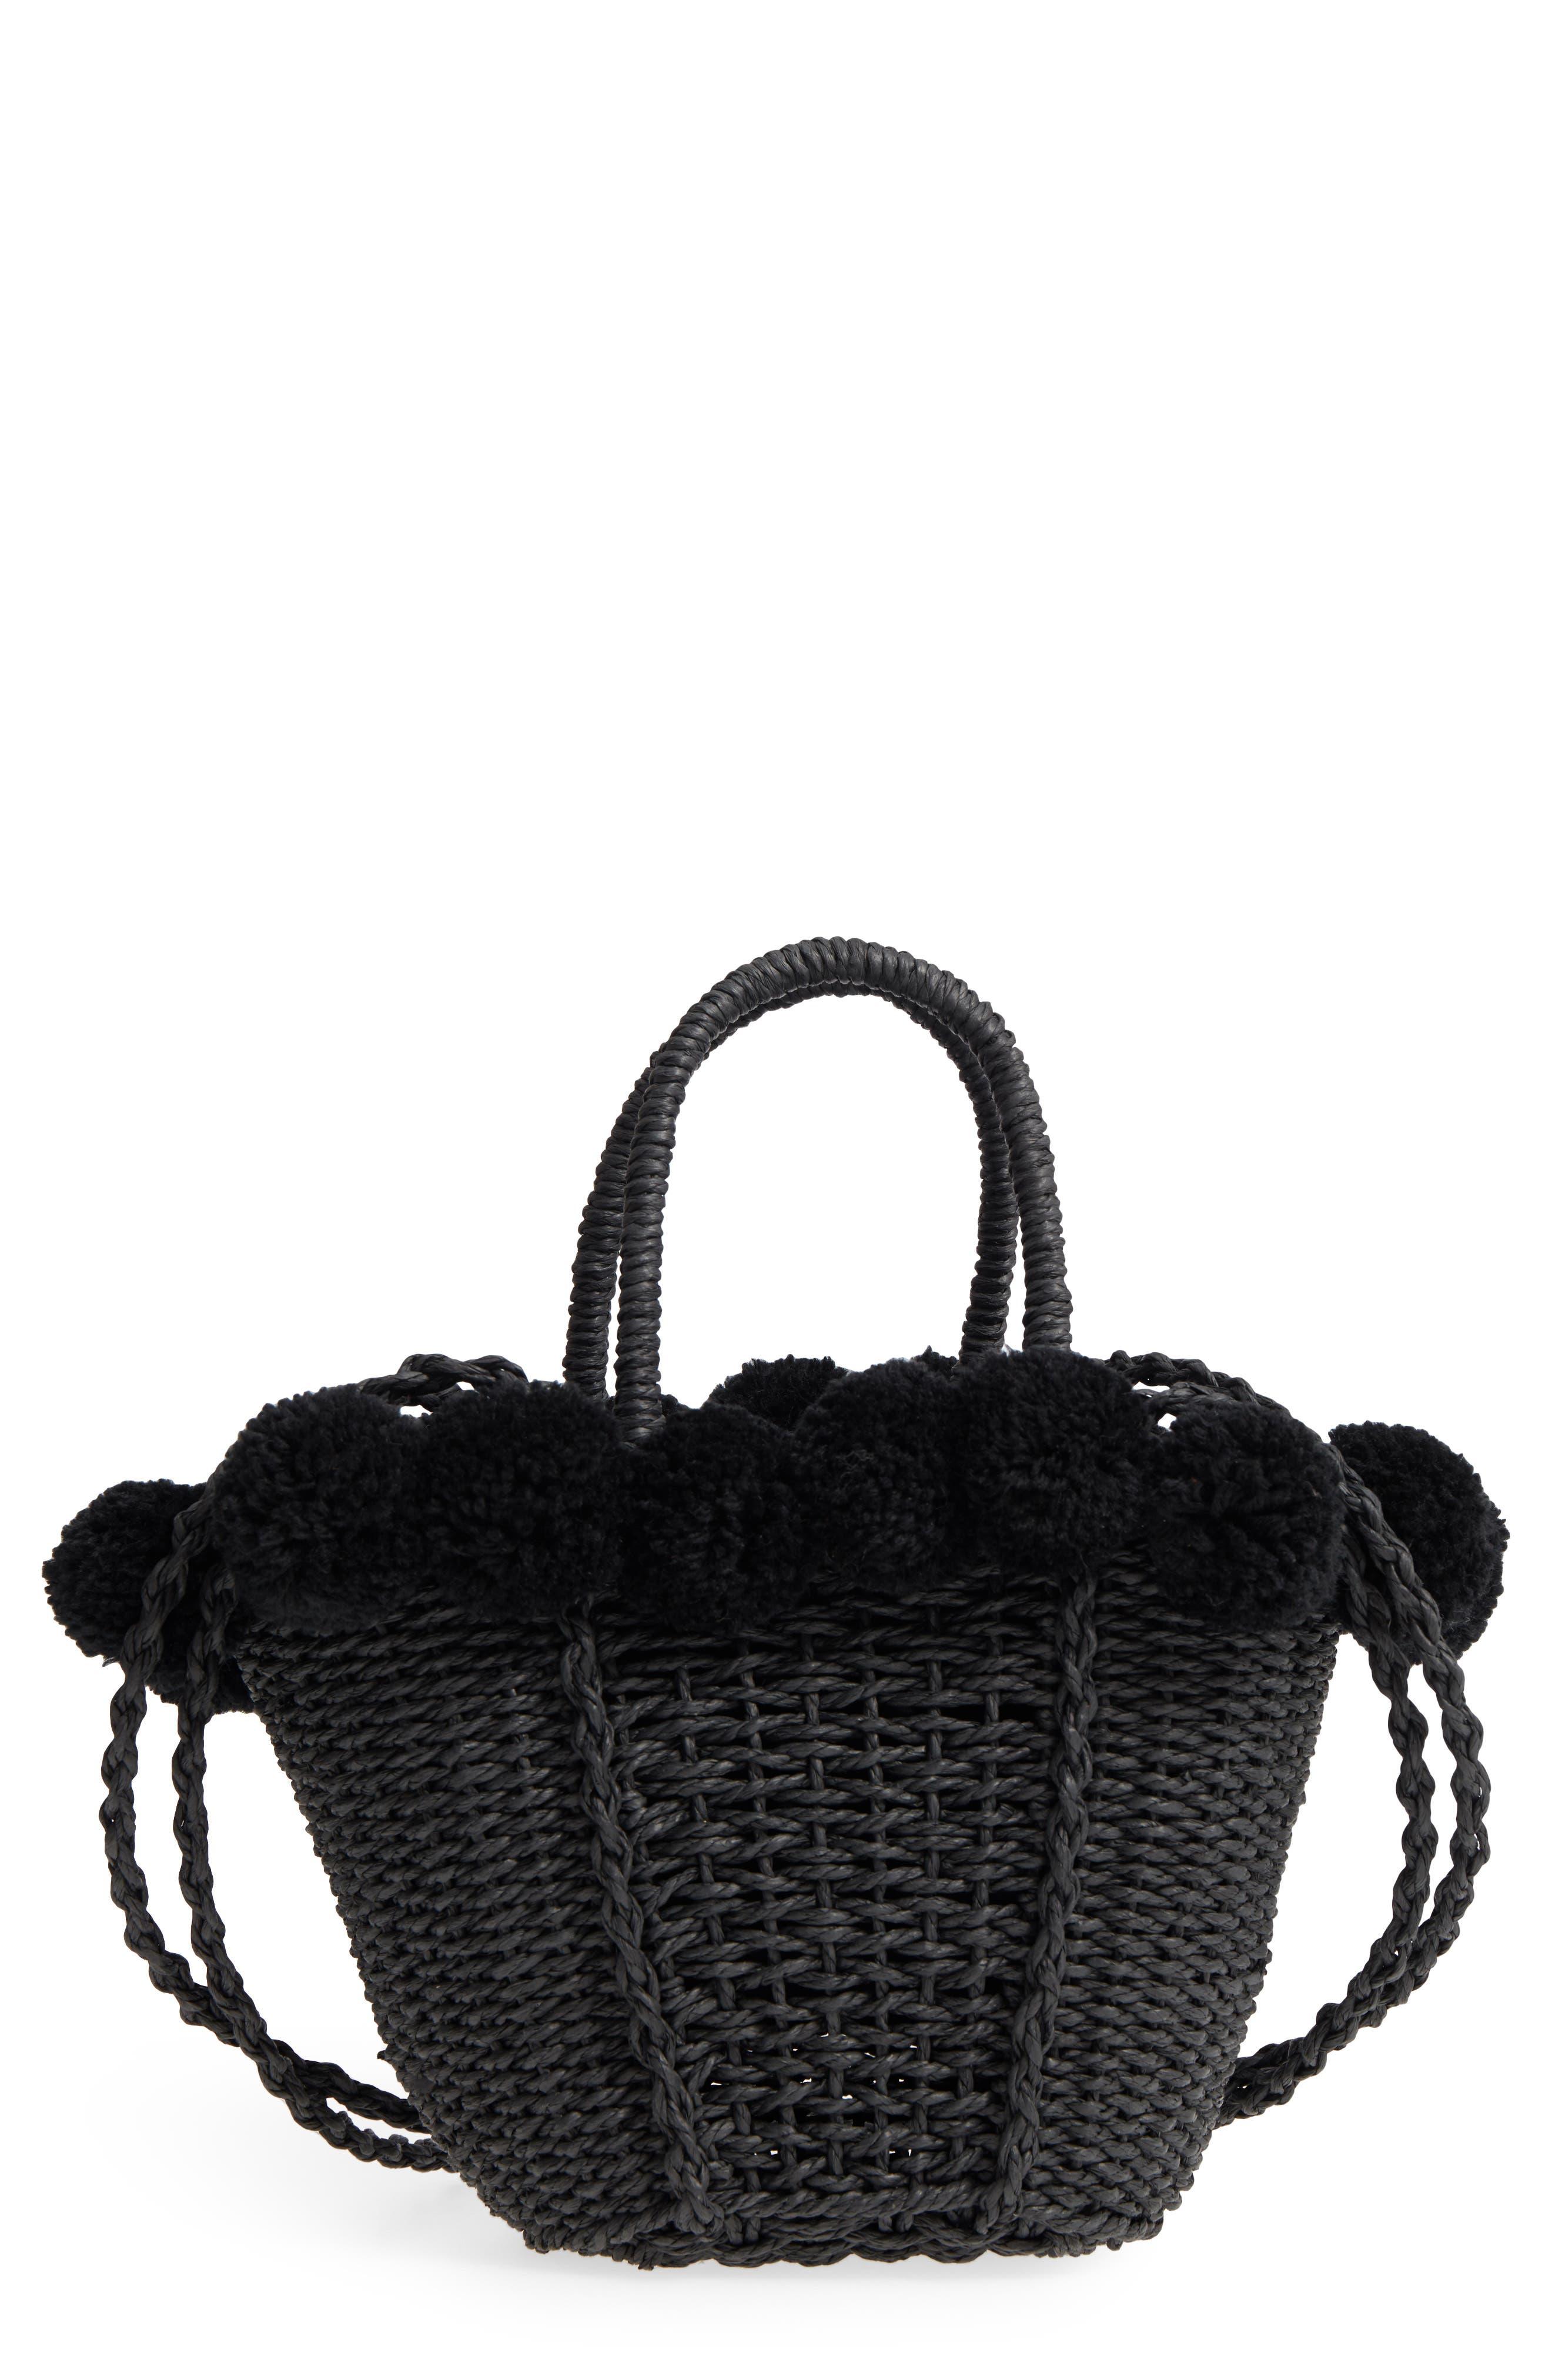 Sia Pom Straw Shopper Bag,                             Main thumbnail 1, color,                             Black